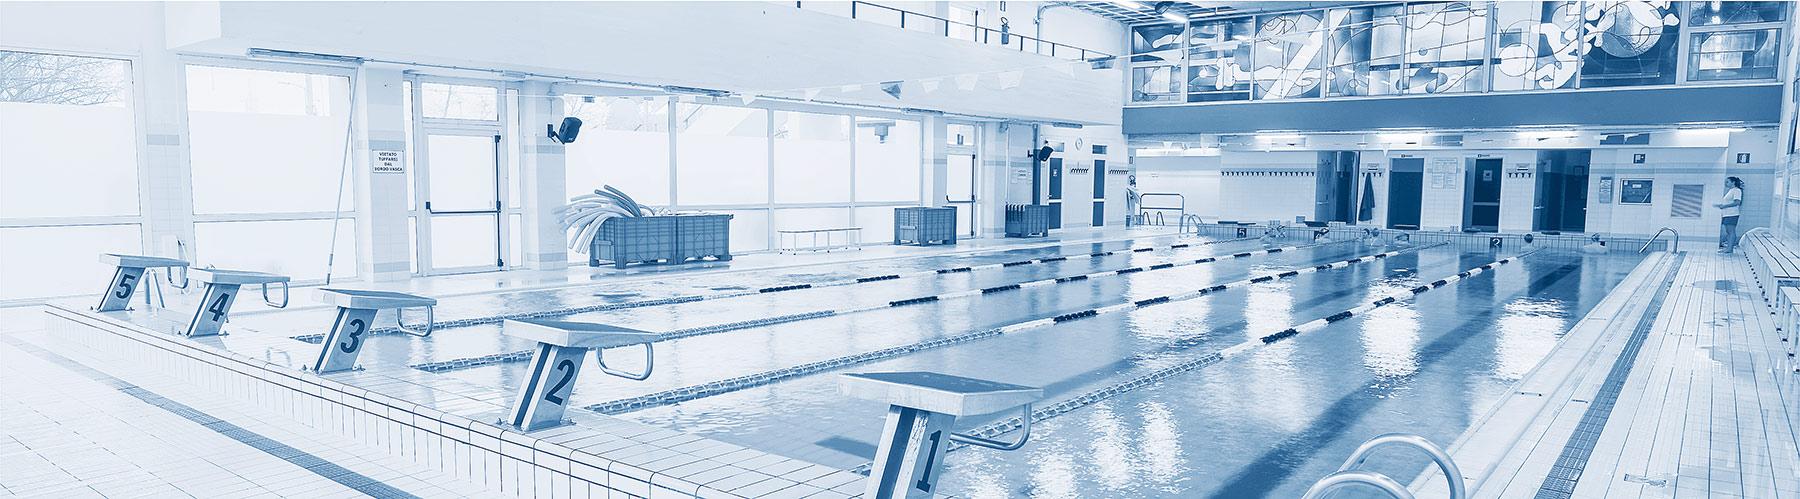 piscina di codroipo piscine kuma